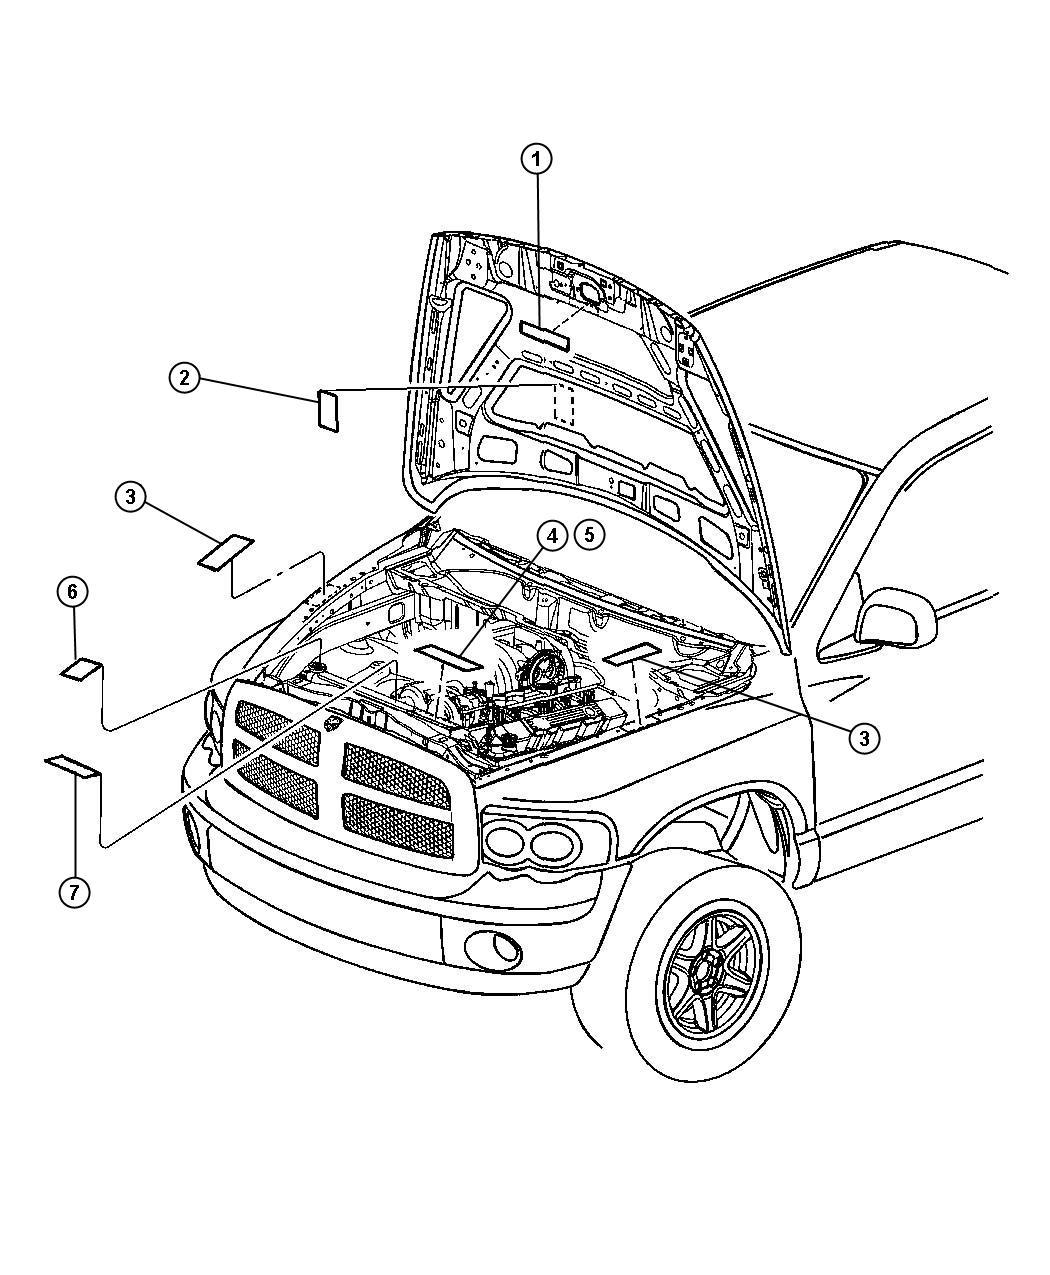 2010 Jeep Grand Cherokee Label. Emission. [emissions